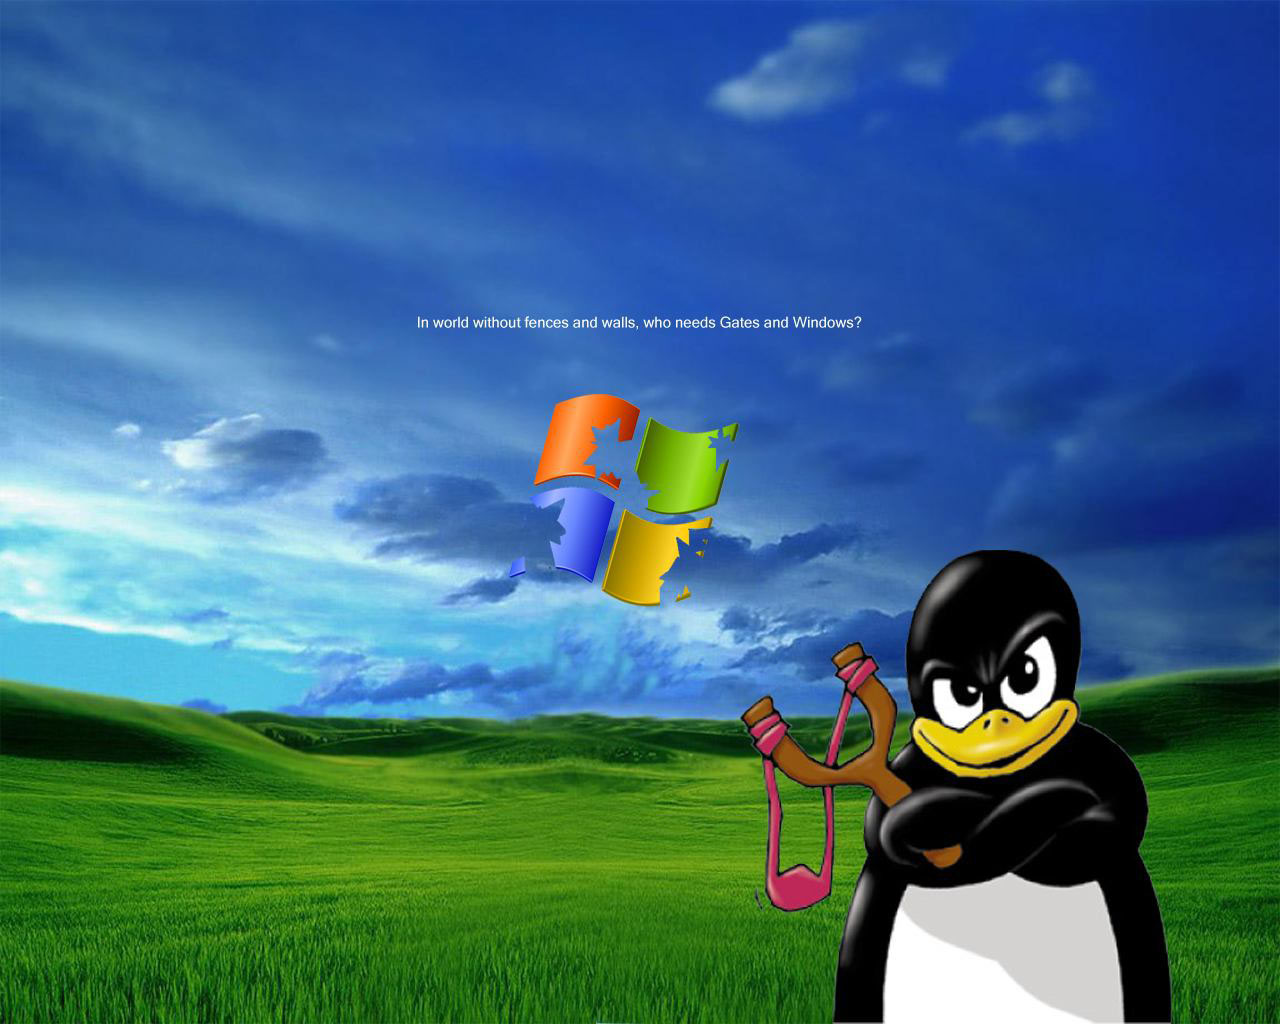 http://1.bp.blogspot.com/-809EHCF8EHo/URqHxEbVtXI/AAAAAAAABo0/crx6MnbYoCA/s1600/desktop%2Bwallpaper.jpg